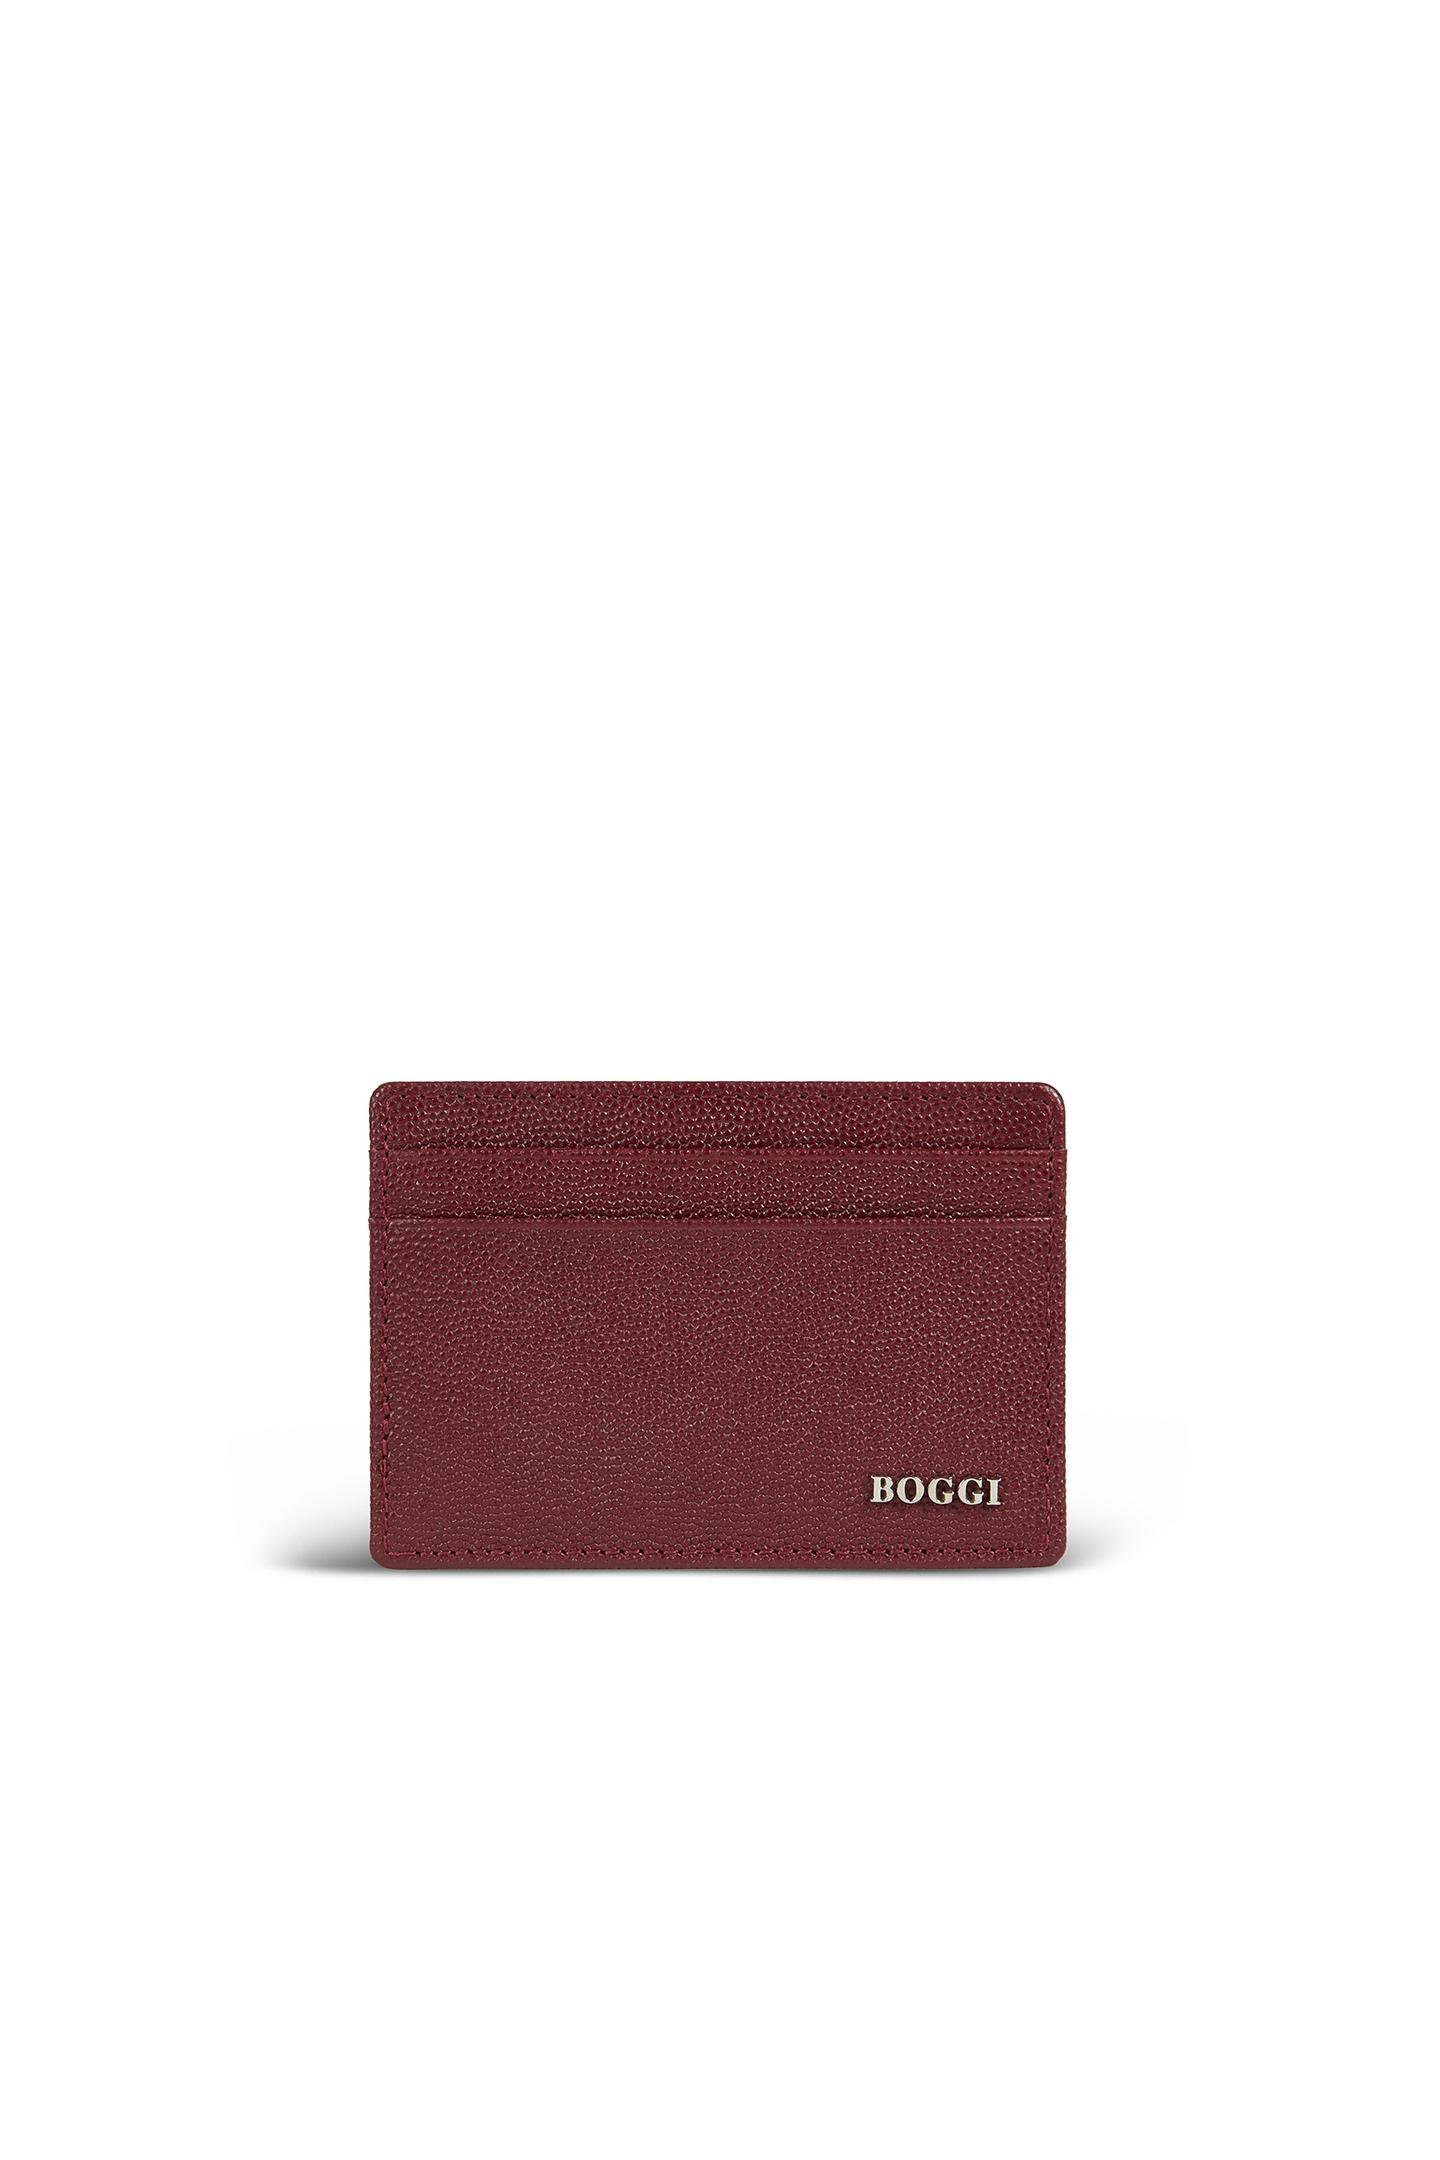 5287f23b9af4cd CAVIAR LEATHER CARD HOLDER, Red, large